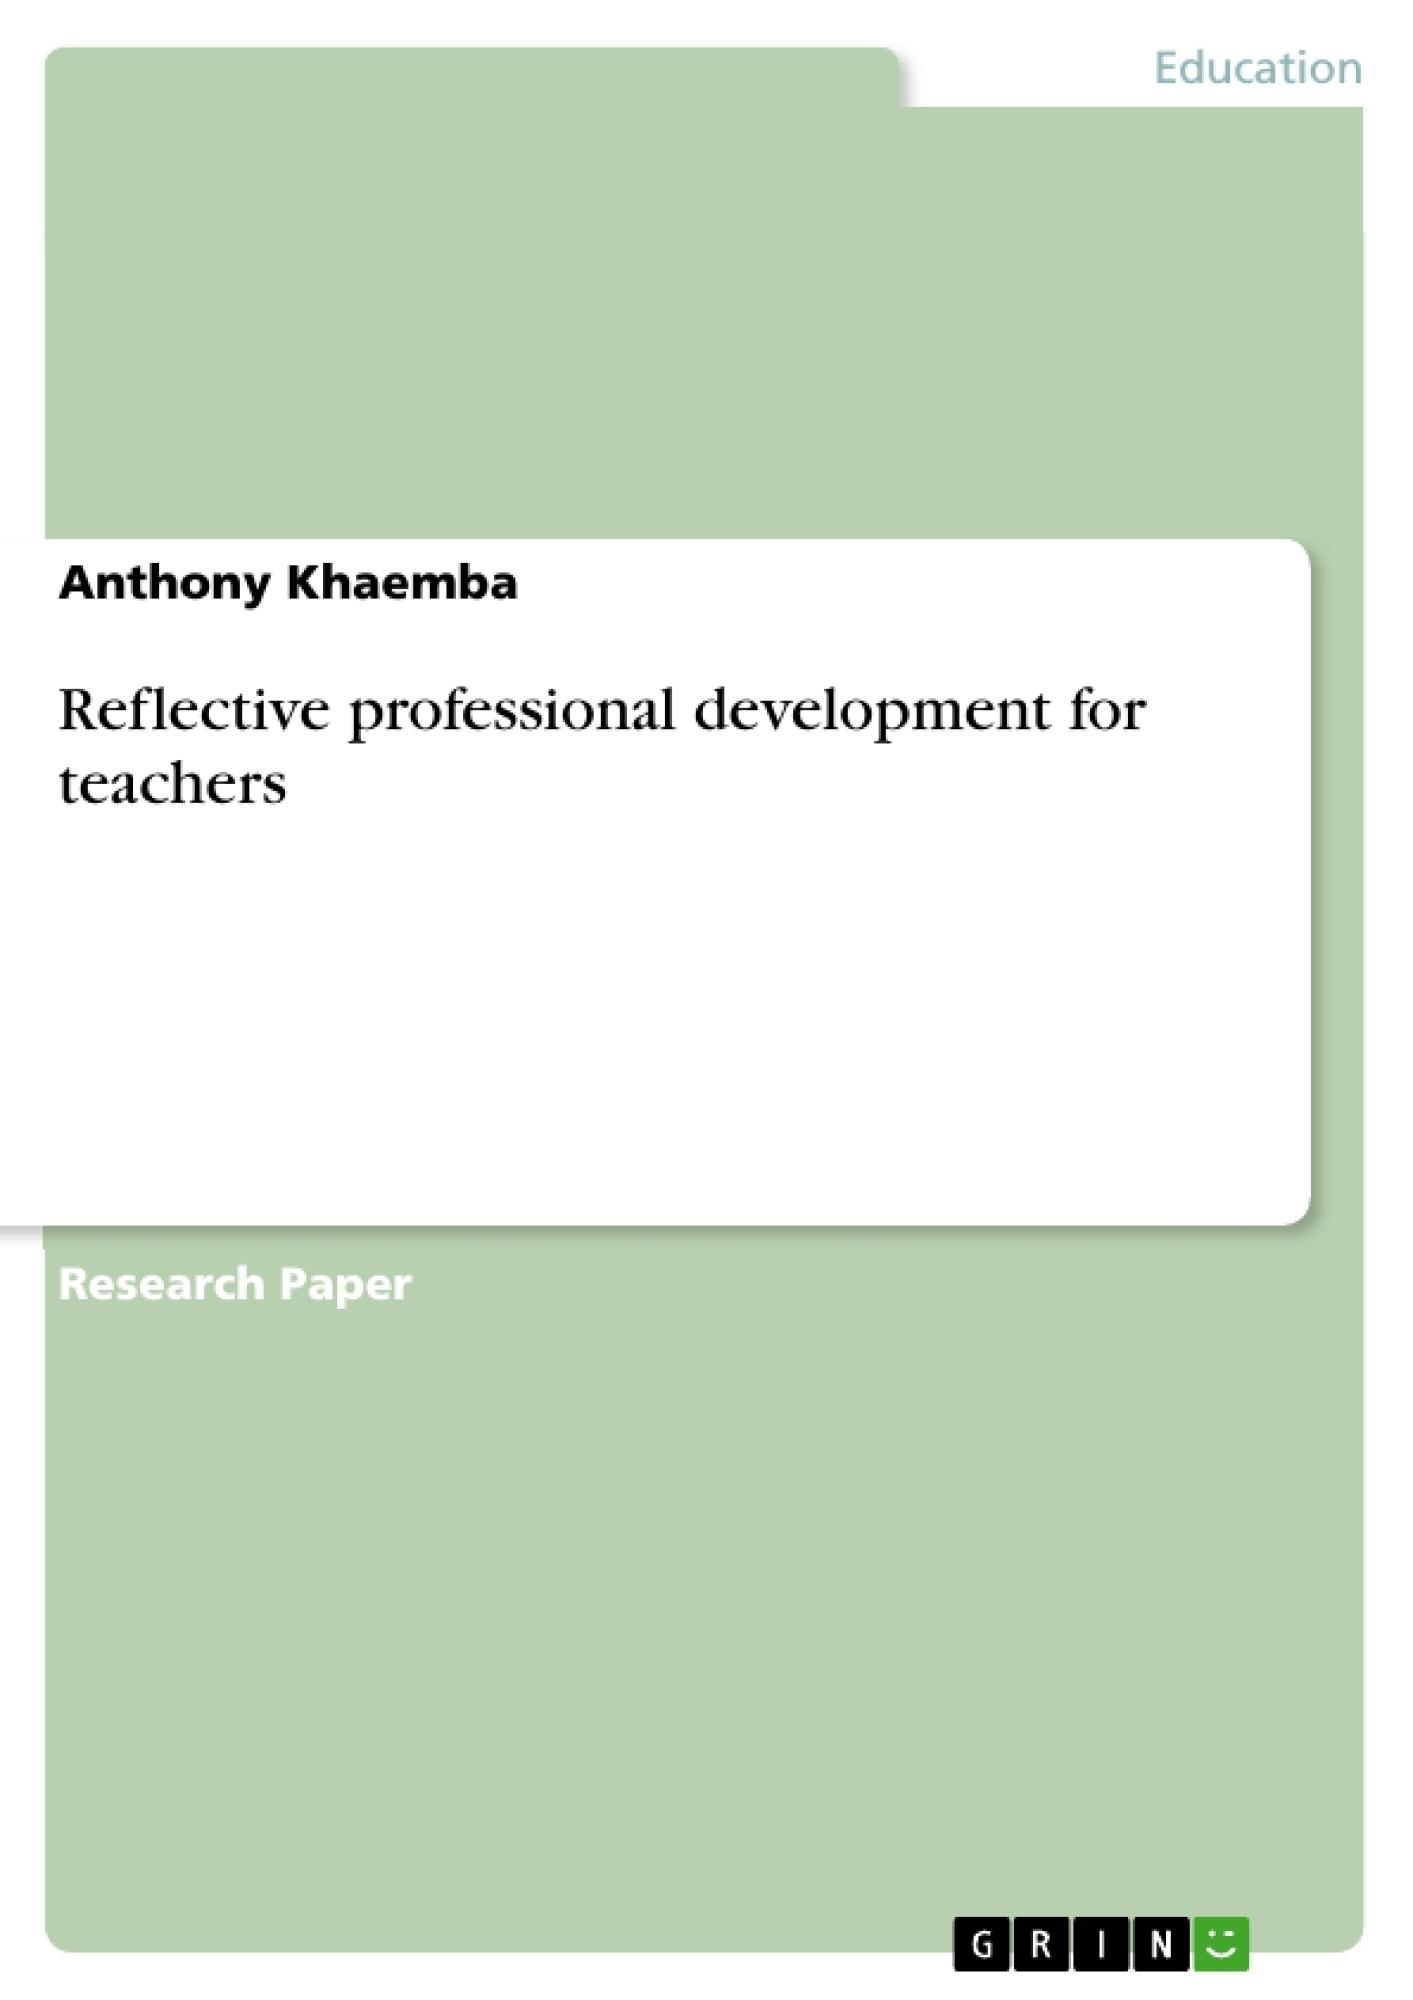 Title: Reflective professional development for teachers